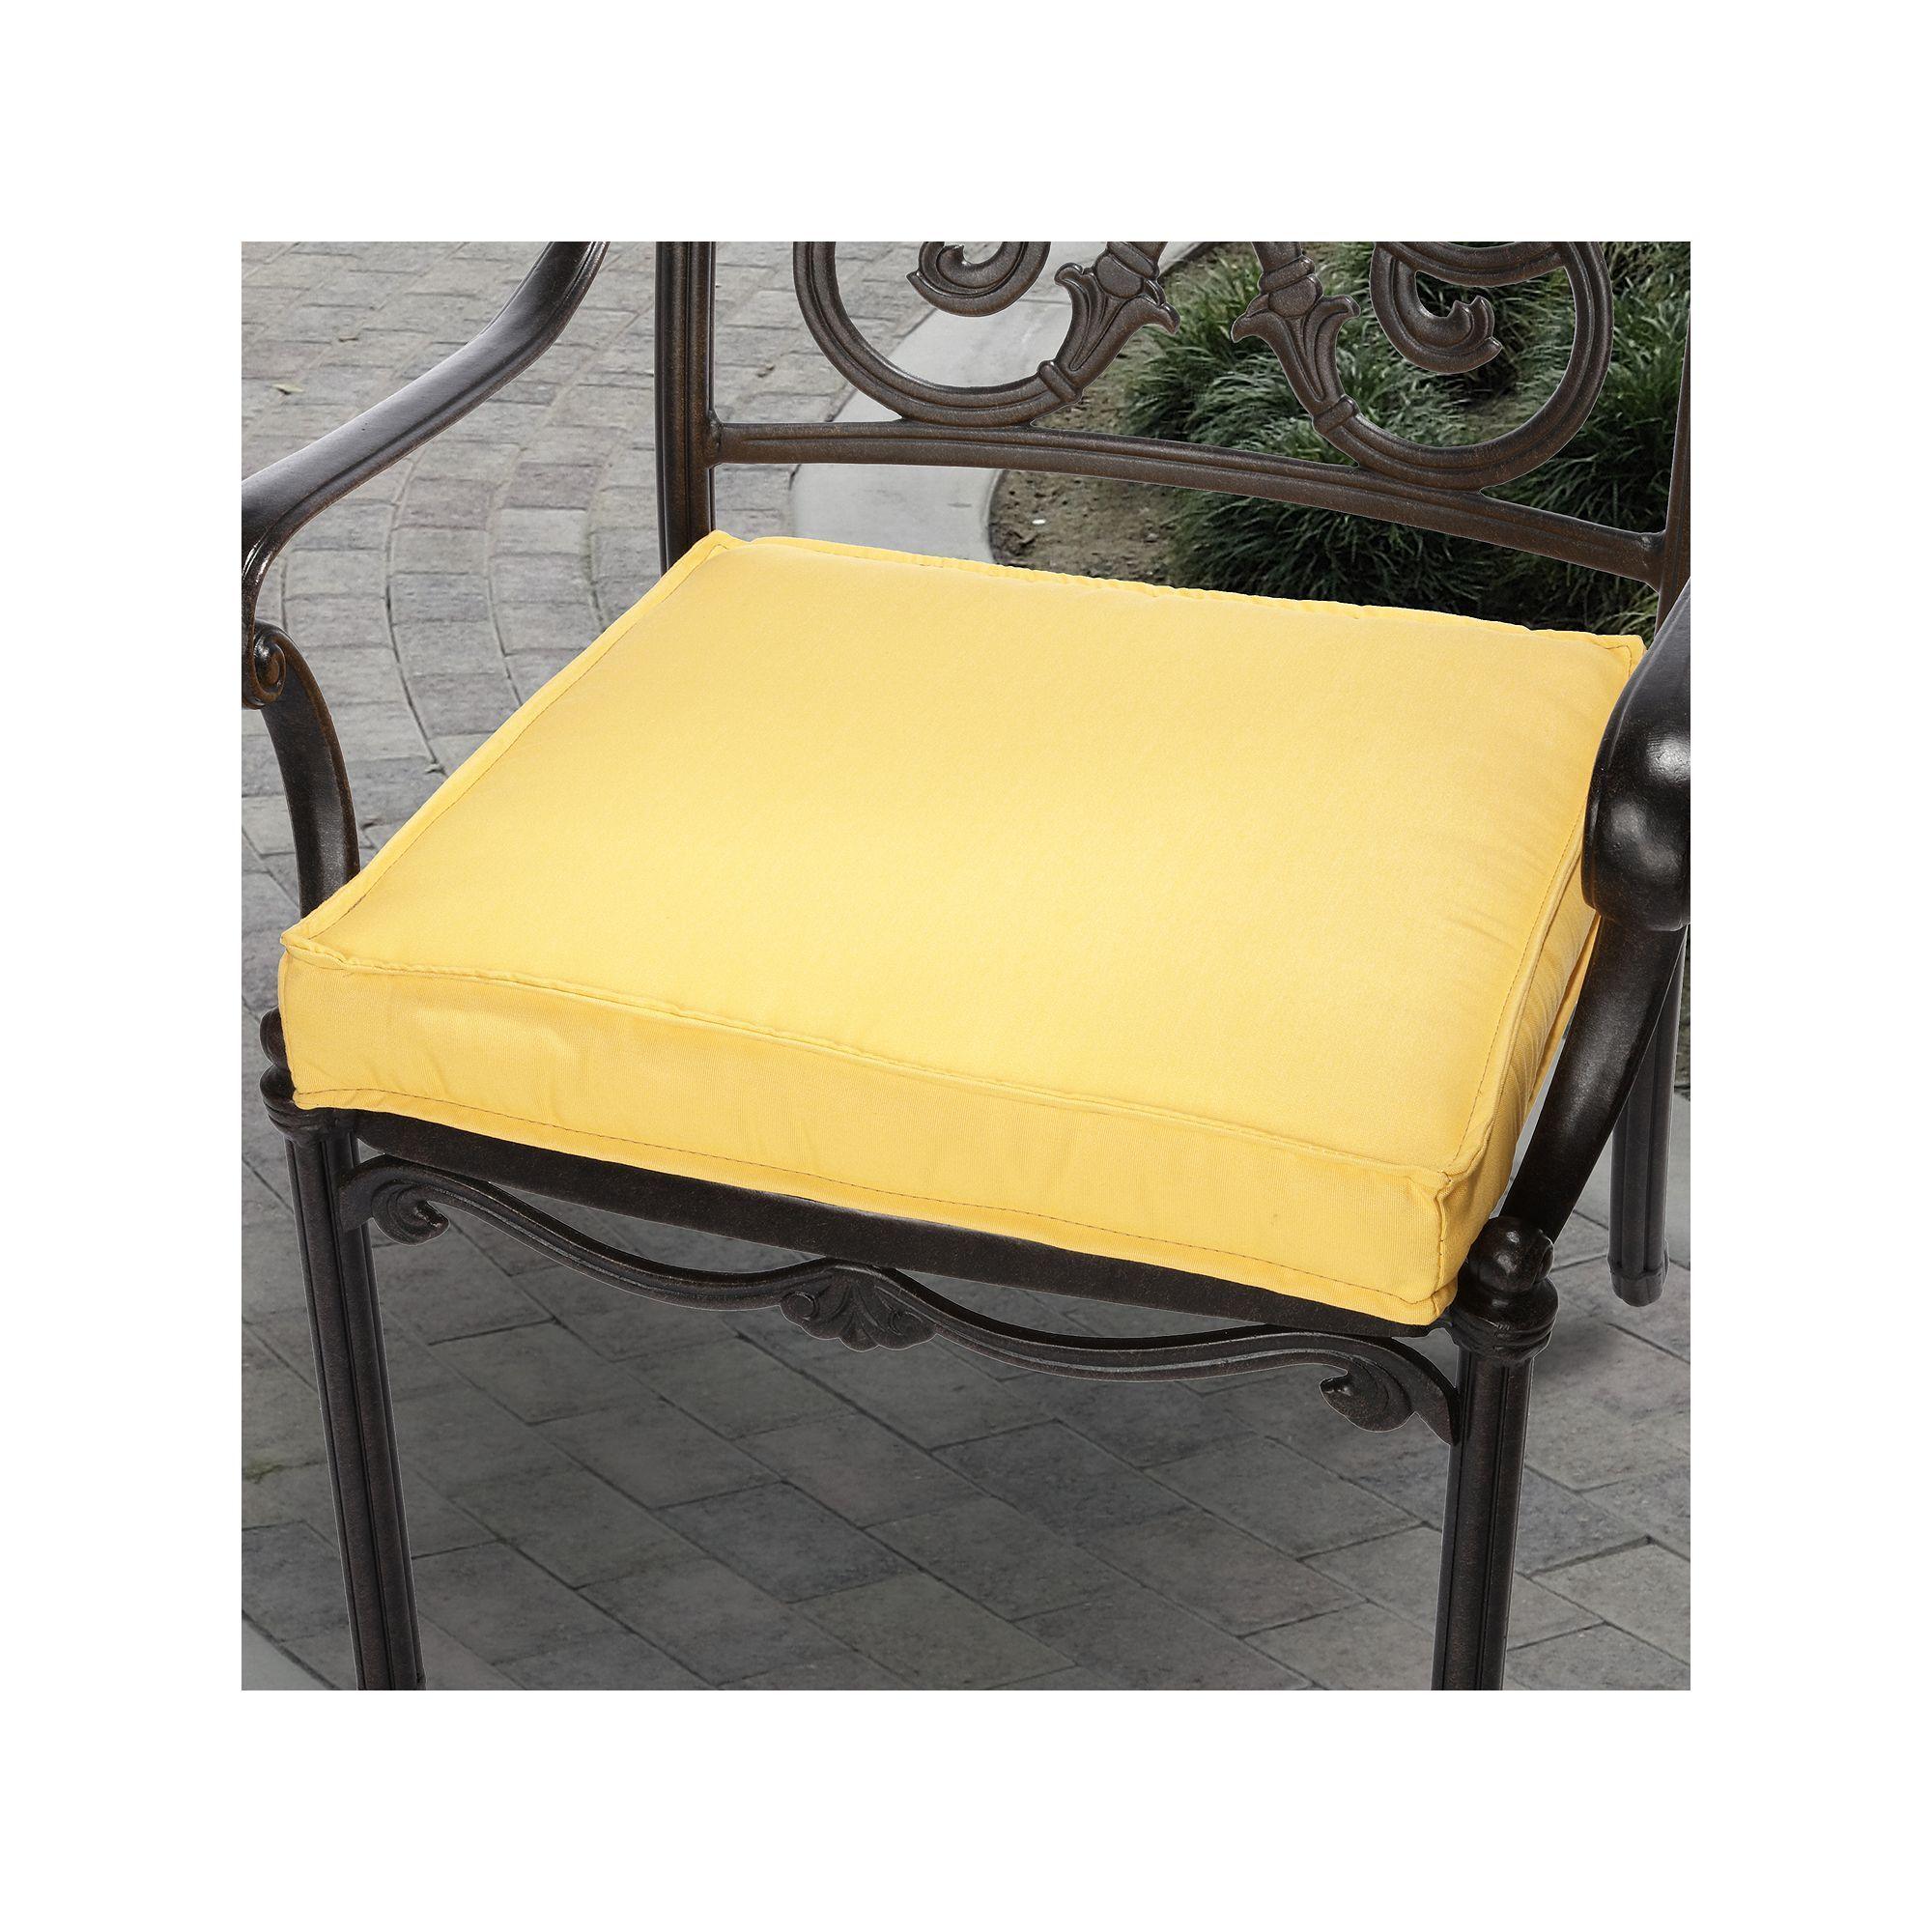 Canvas Outdoor Chair Cushion, Yellow